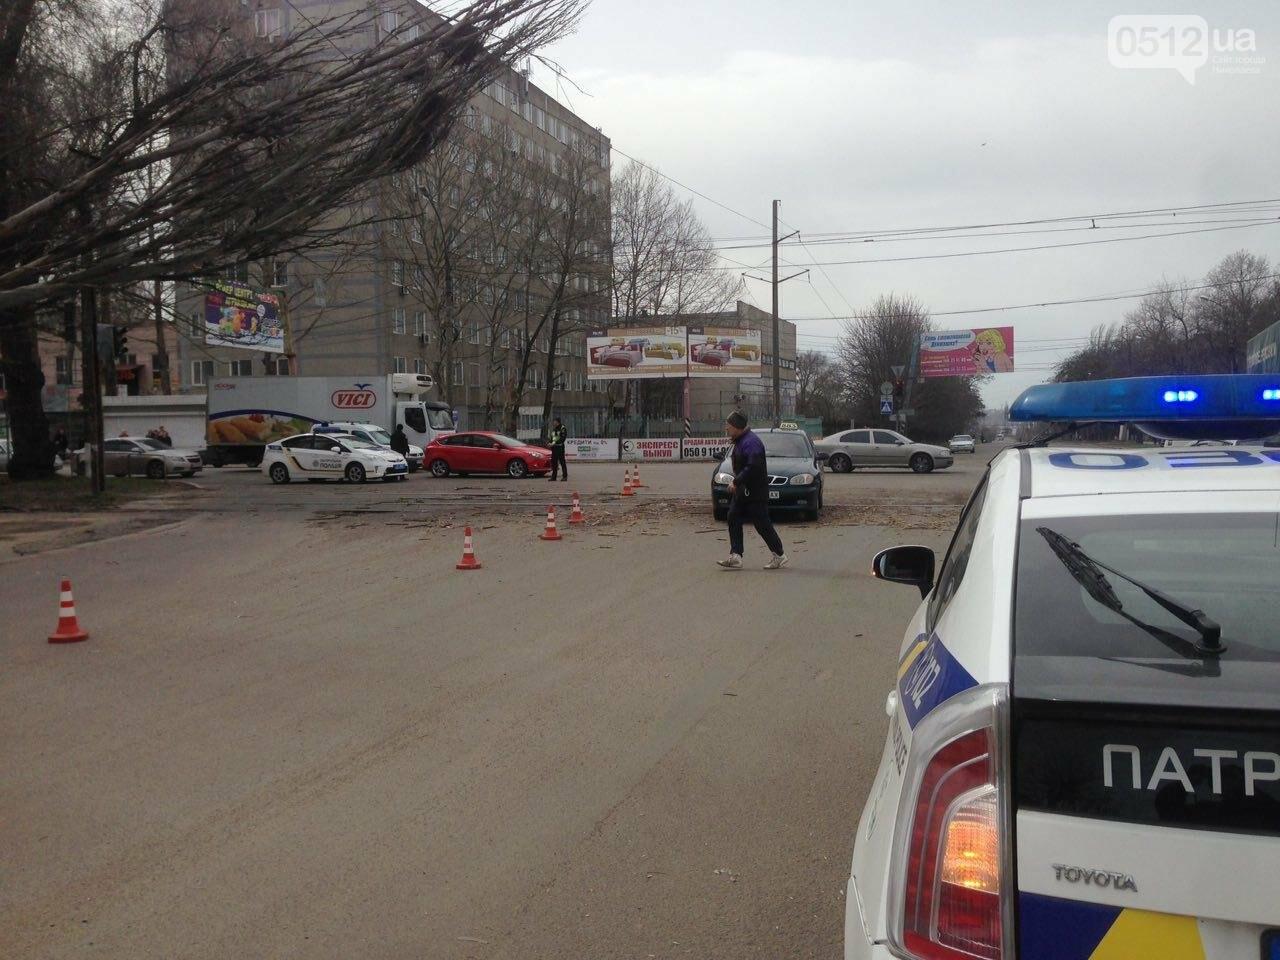 В Николаеве из-за сильного ветра дерево упало на дорогу и задело провода, - ФОТО, фото-1